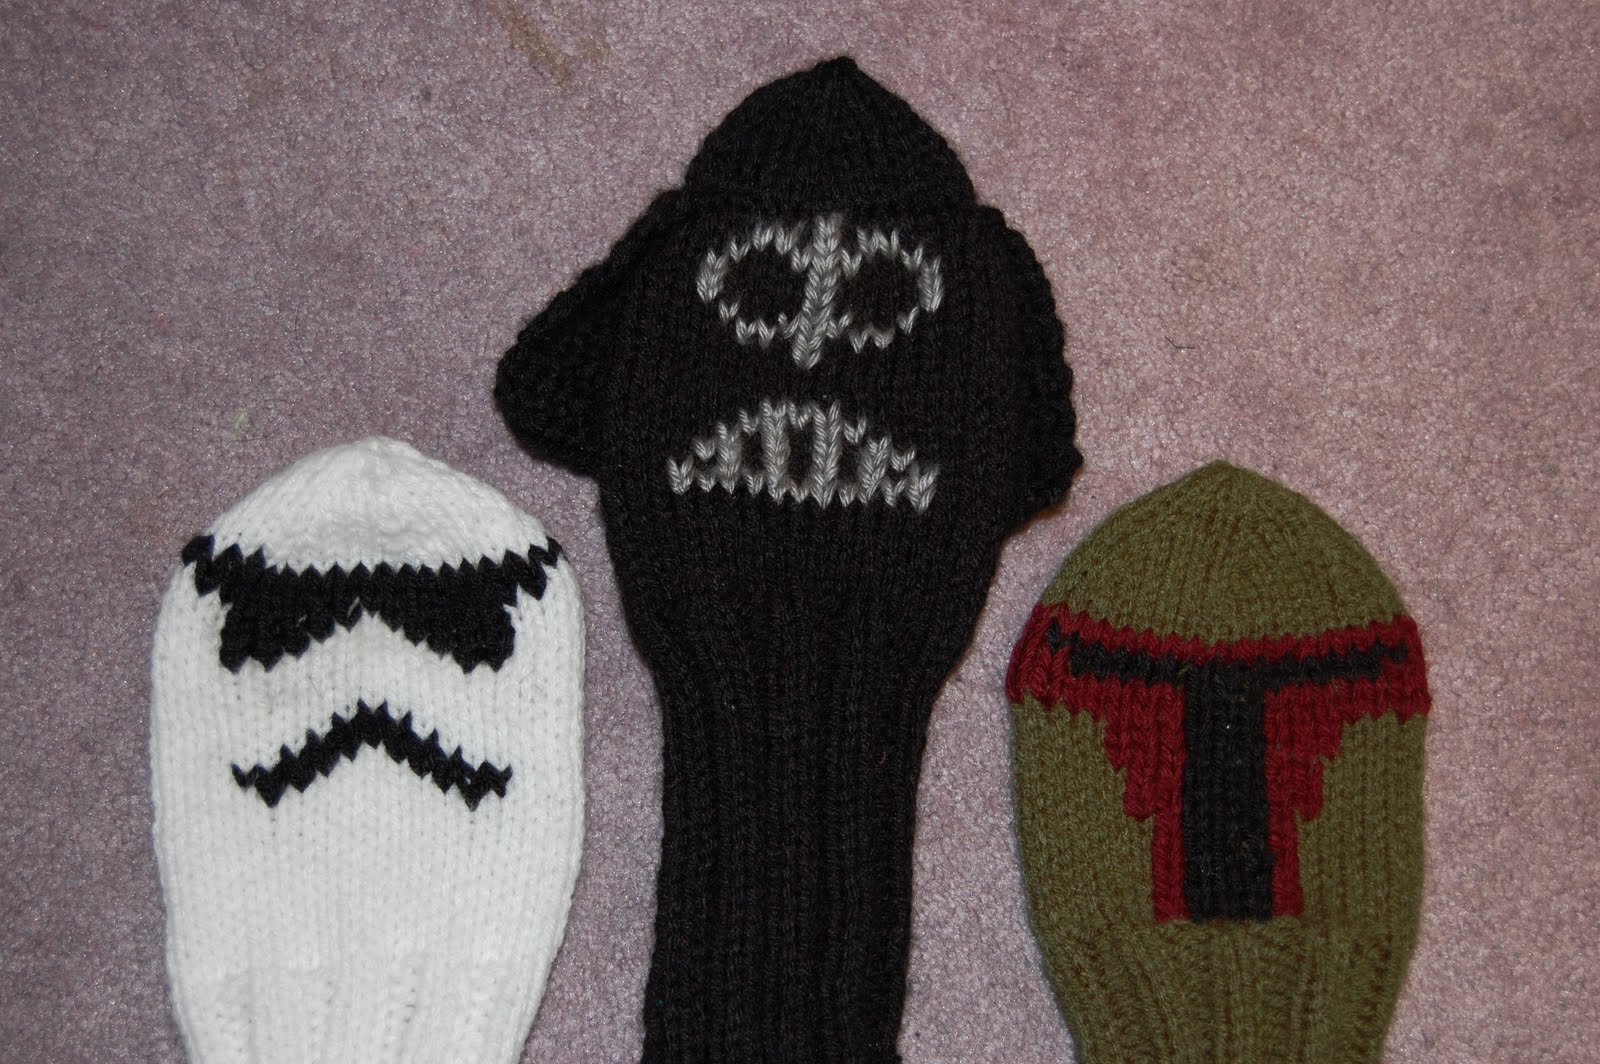 Katiedid Crafts Darth Vader Golf Club Cover Pattern